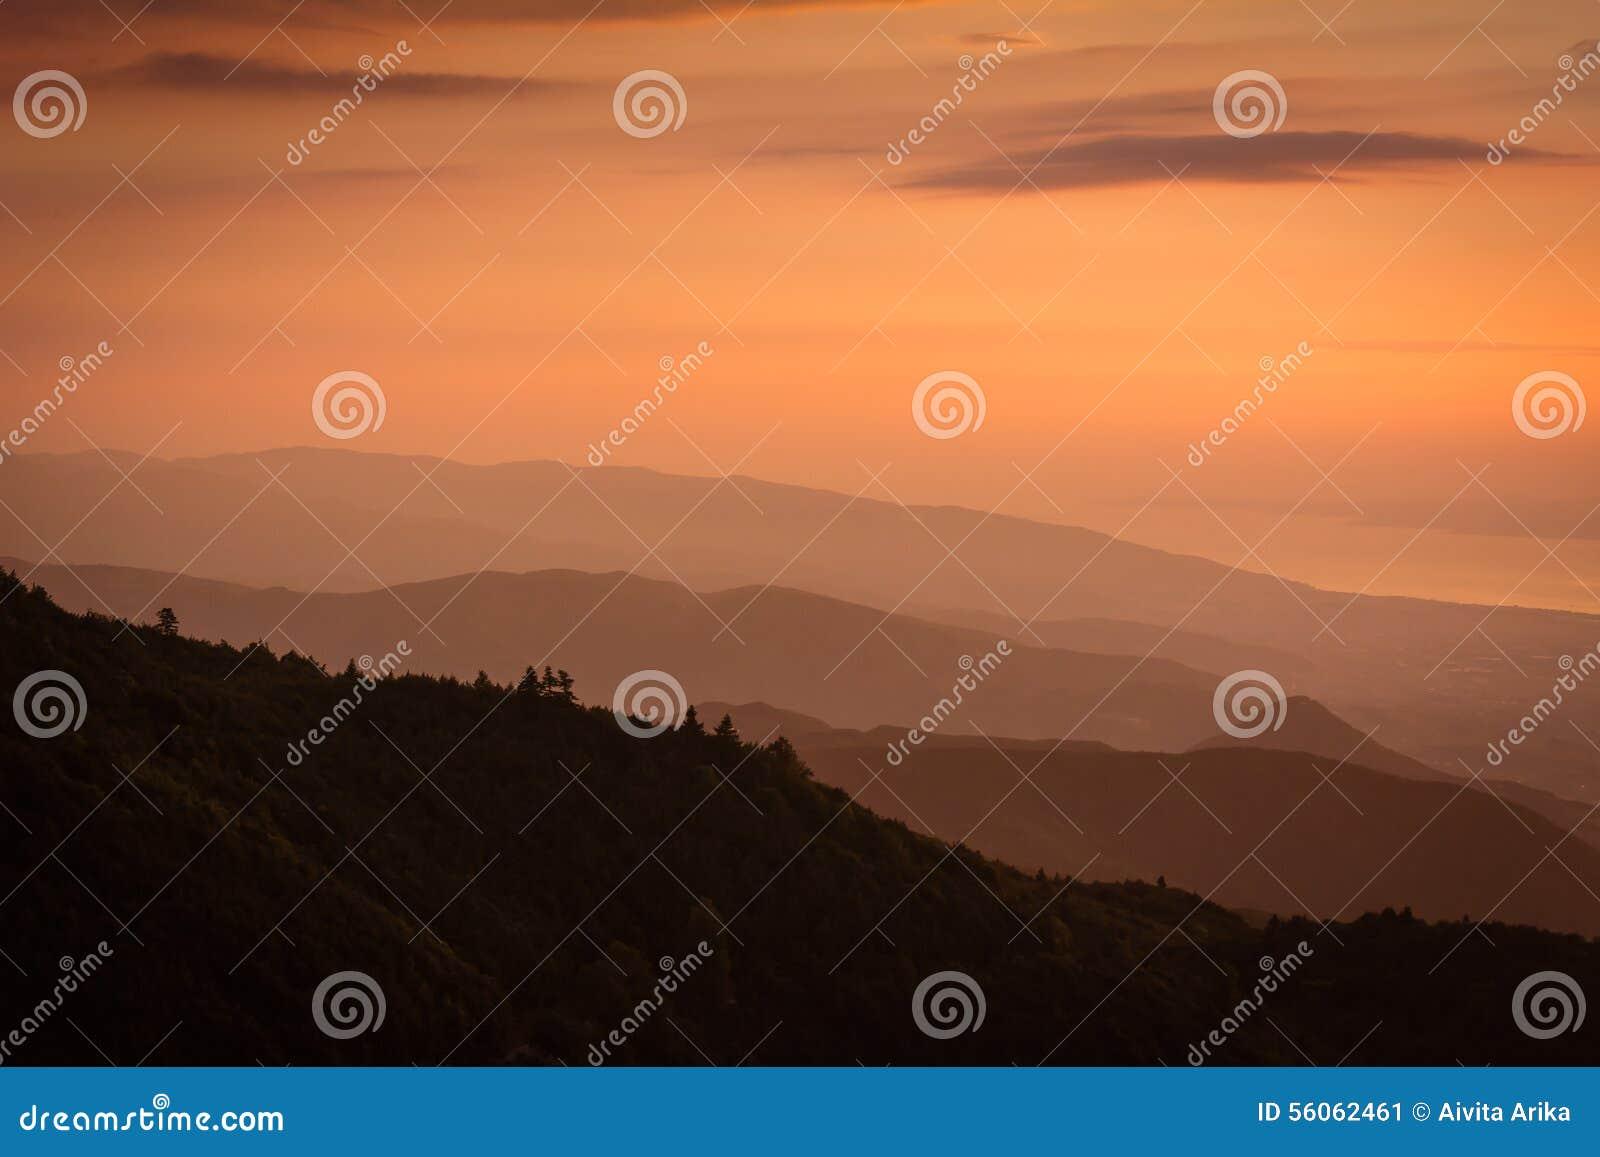 Sunset over Kartepe, Kocaeli, Turkey. Layers and atmosphere.